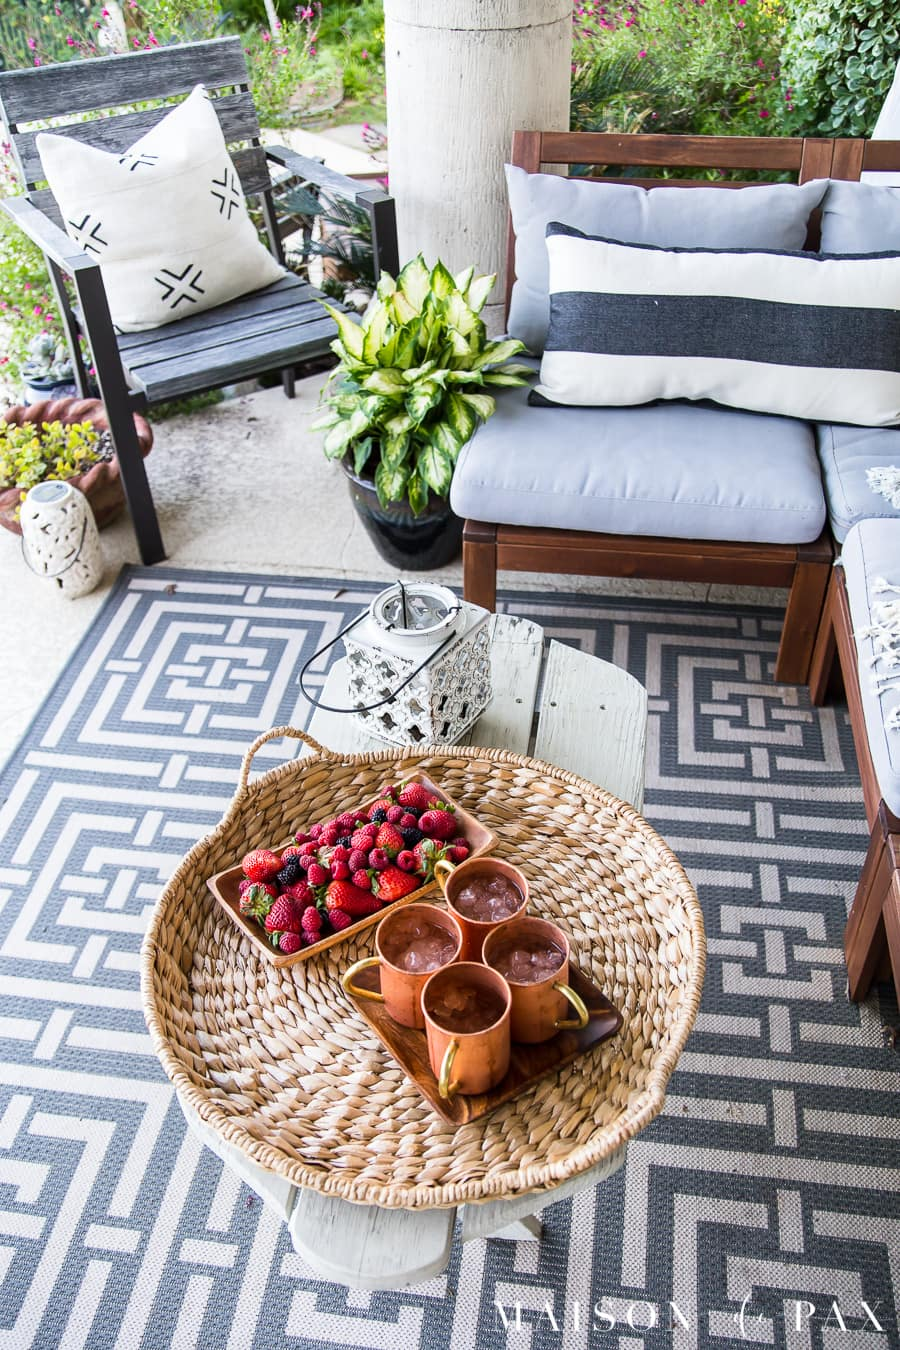 Summer Porch Decor Ideas: Ferns and Succulents - Maison de Pax on Black And White Backyard Decor  id=34487